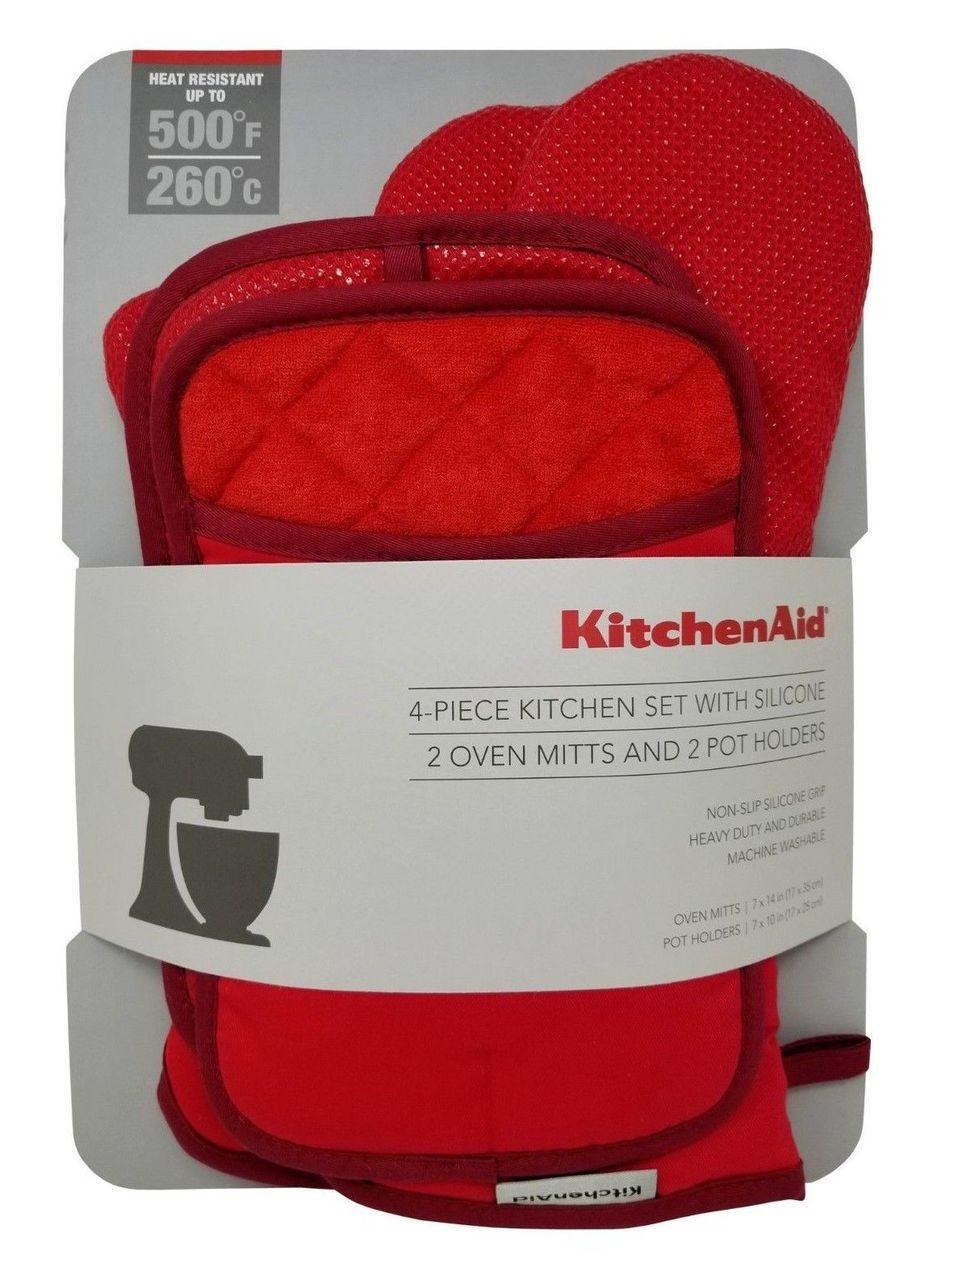 Kitchenaid 4 piece kitchen set with silicone mitts pot holder 1062562